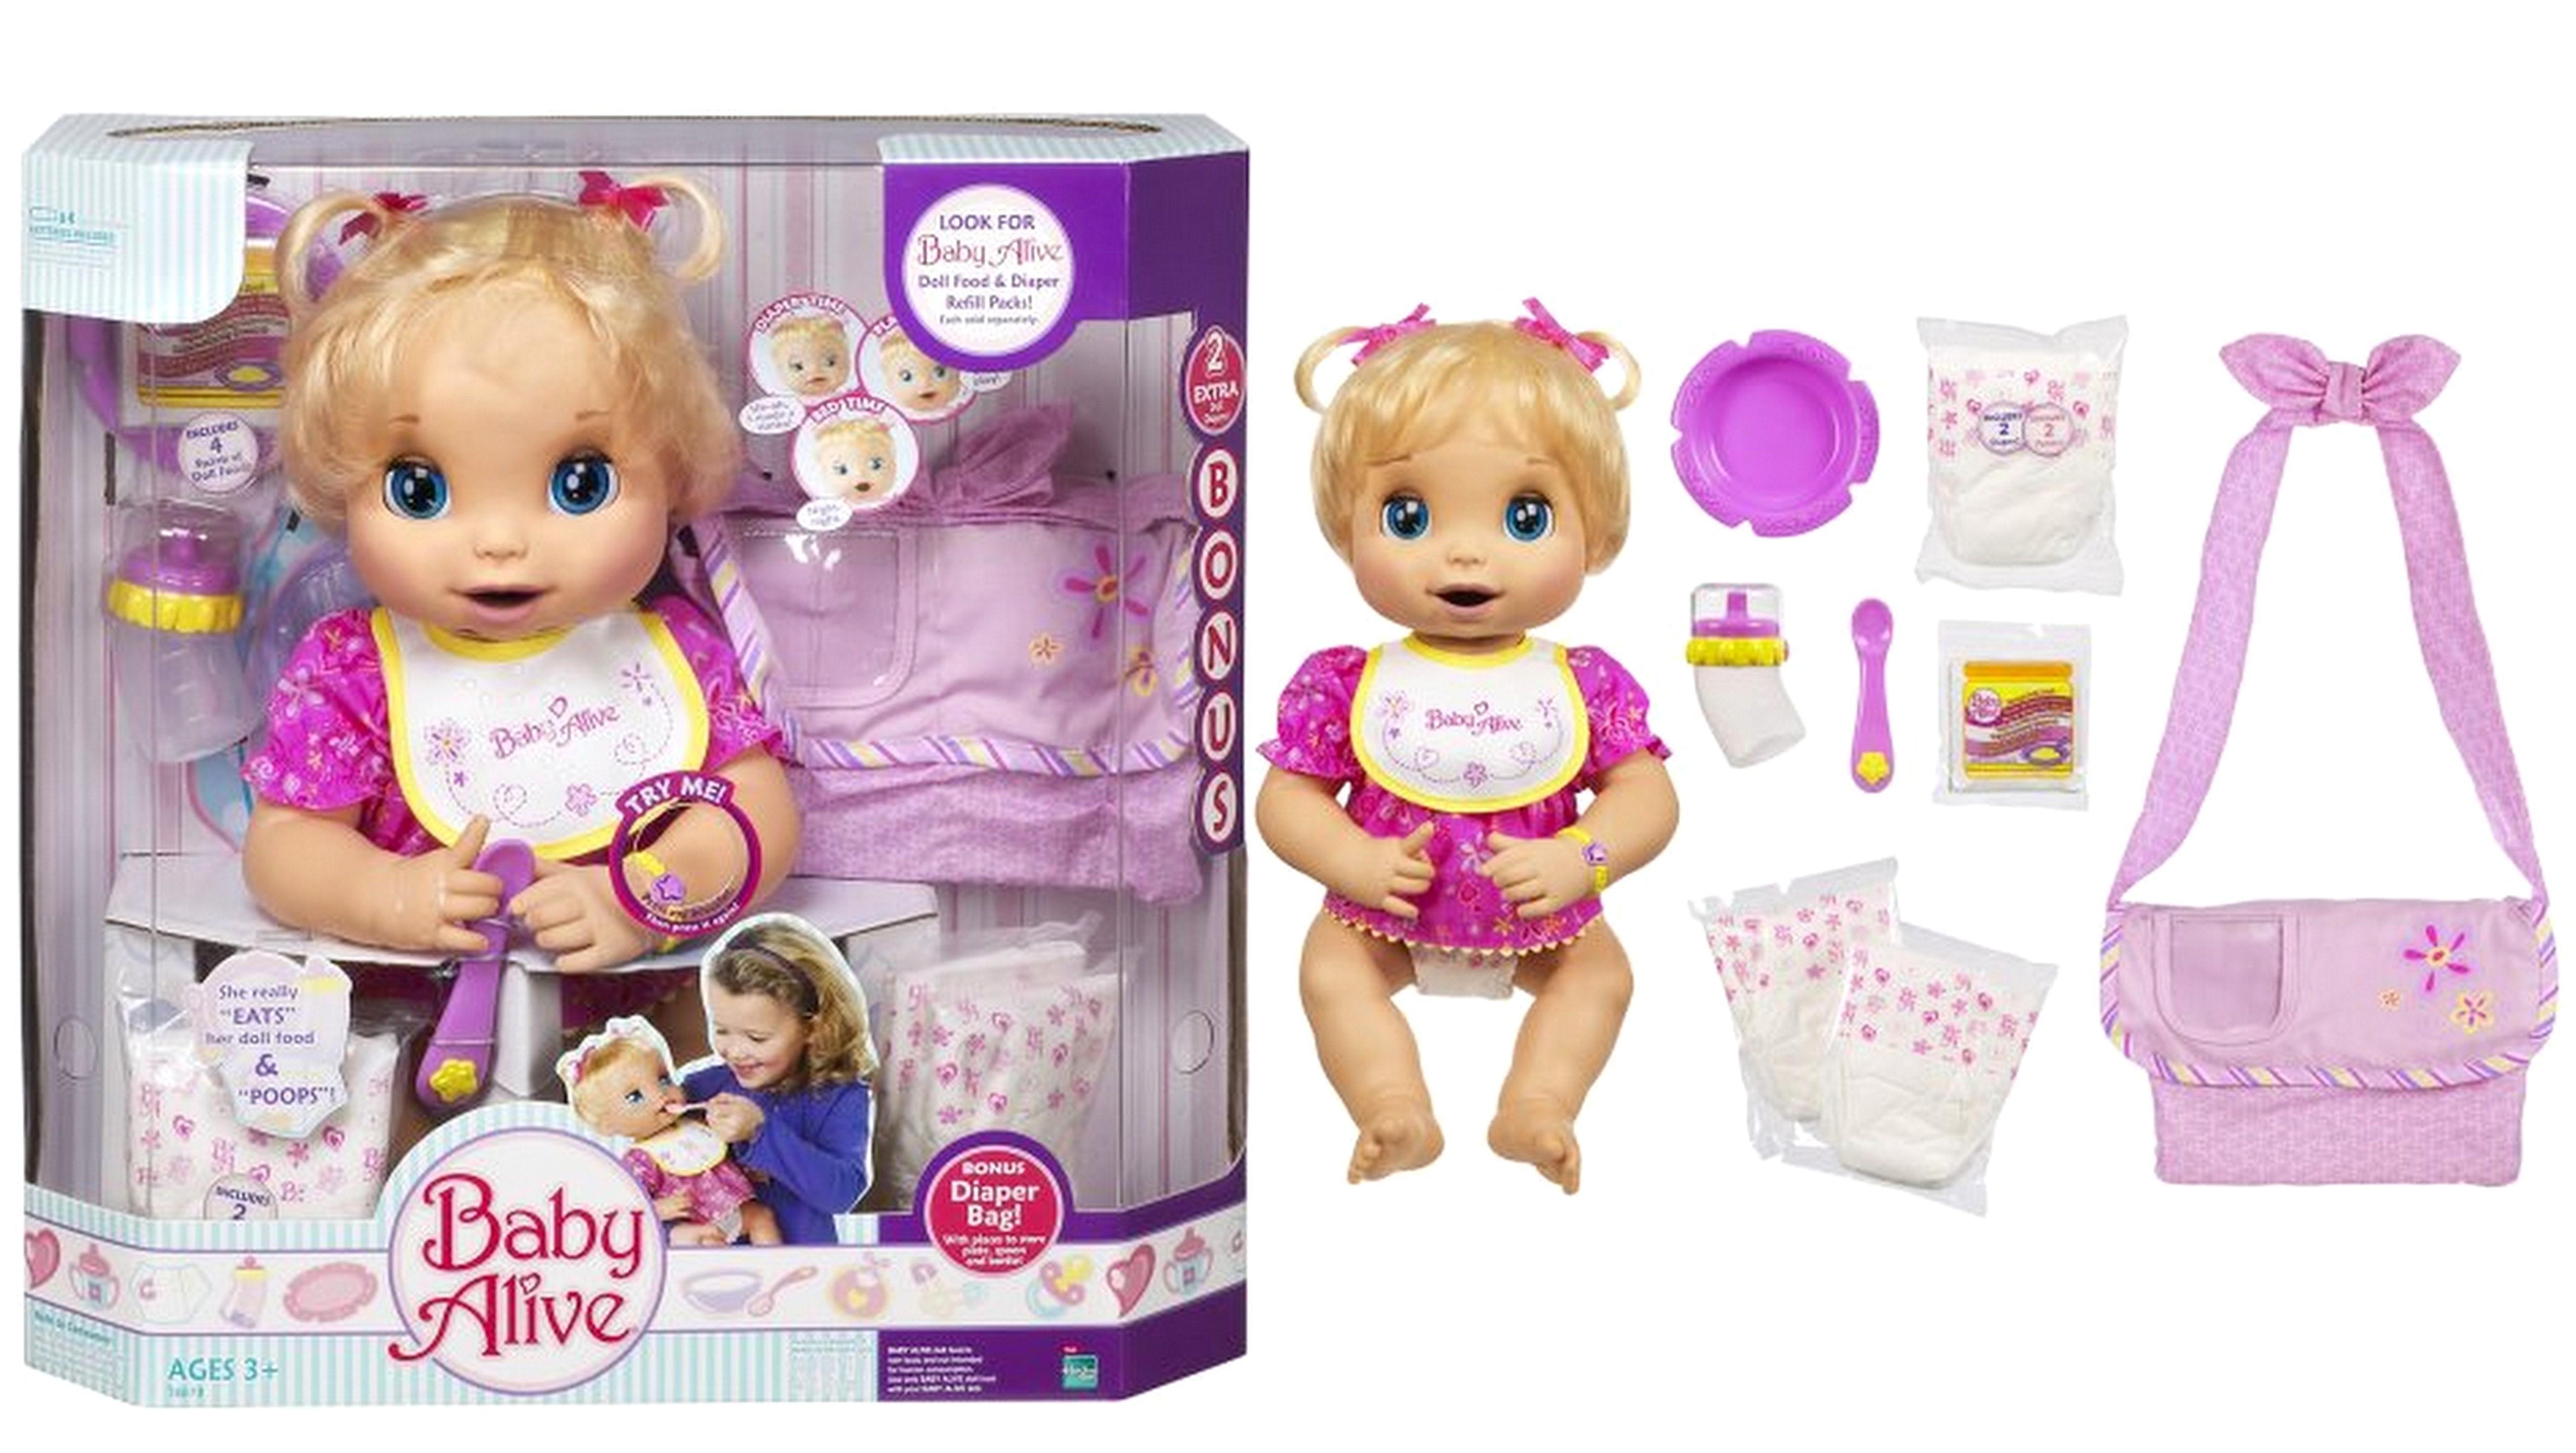 NEW Classic Baby Alive Girl Doll BONUS Diaper Bag Set 2006